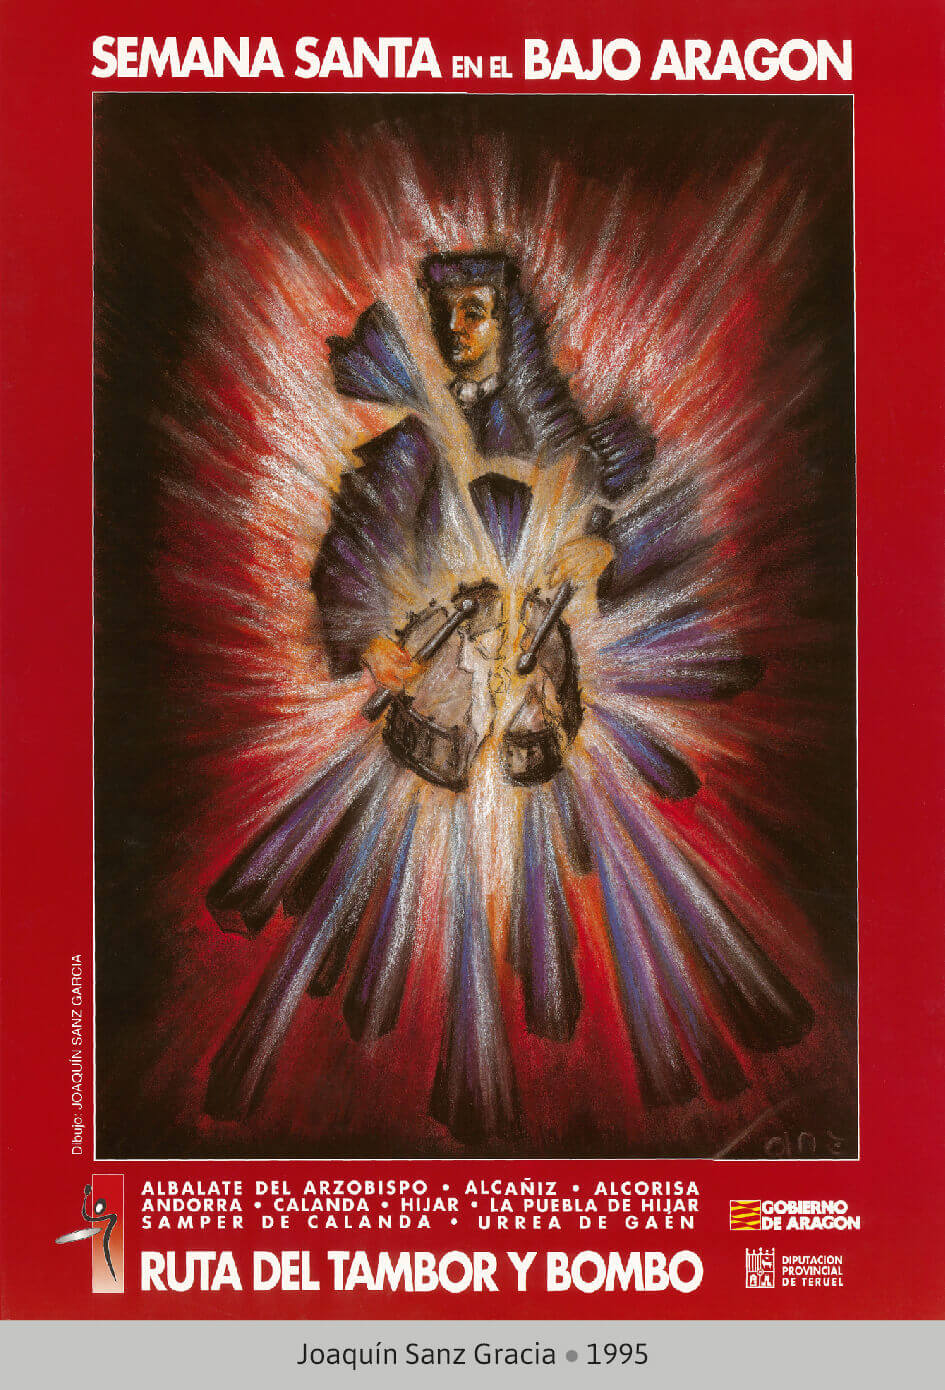 Cartel Ganador Ruta del Tambor y Bombo. Semana Santa 1995